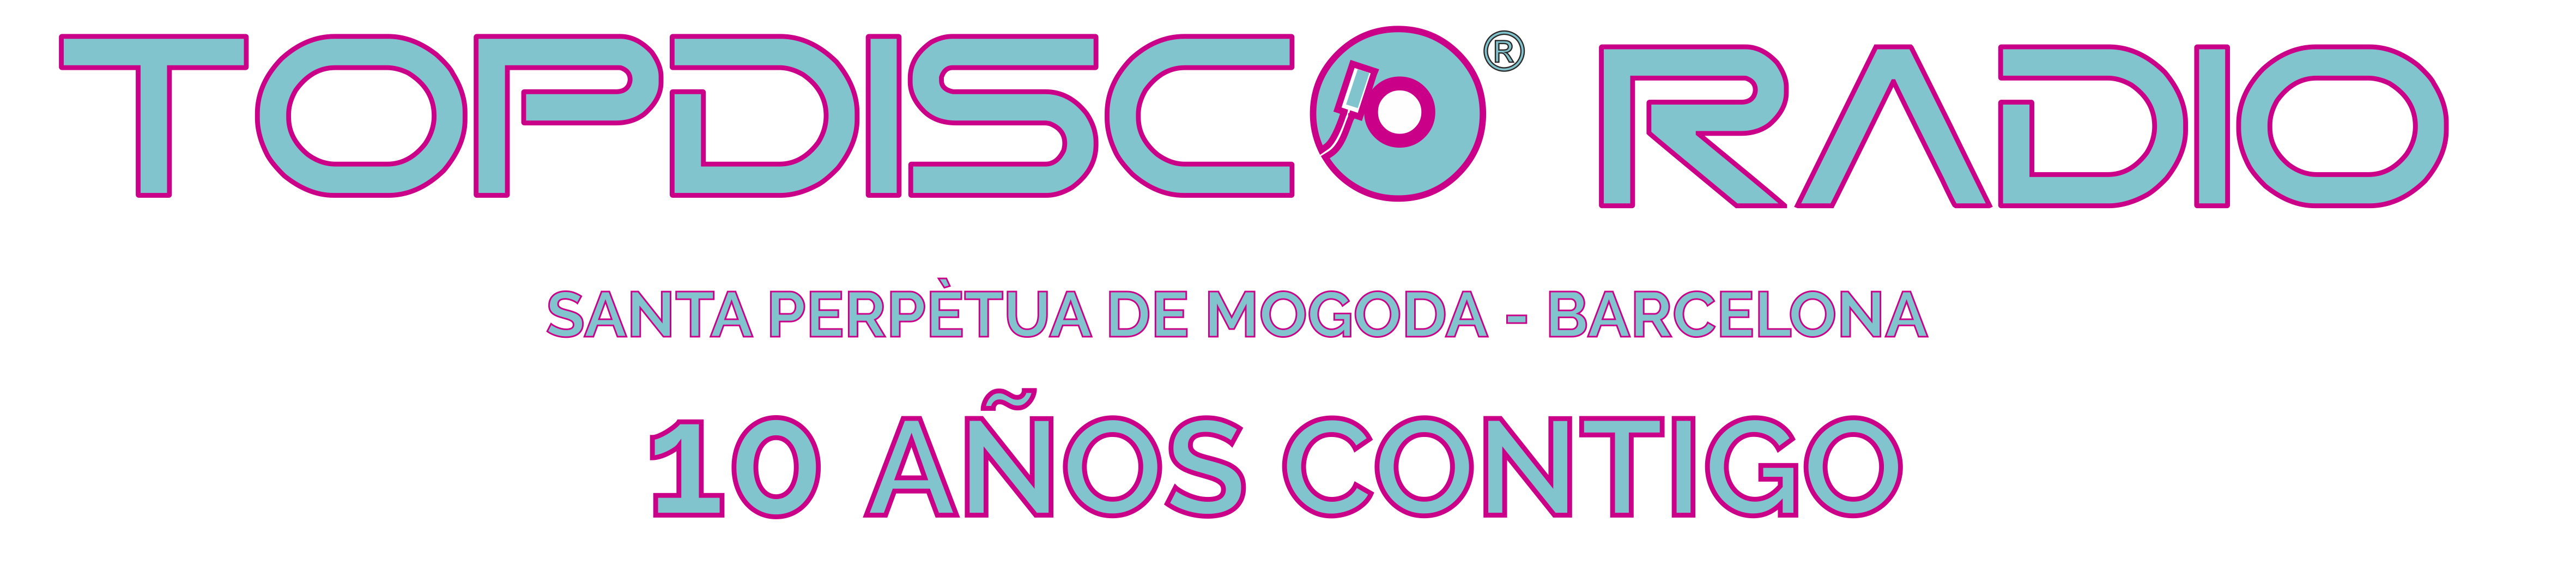 LOGO WEB TOPDISCO RADIO 10 AÑOS CONTIGO